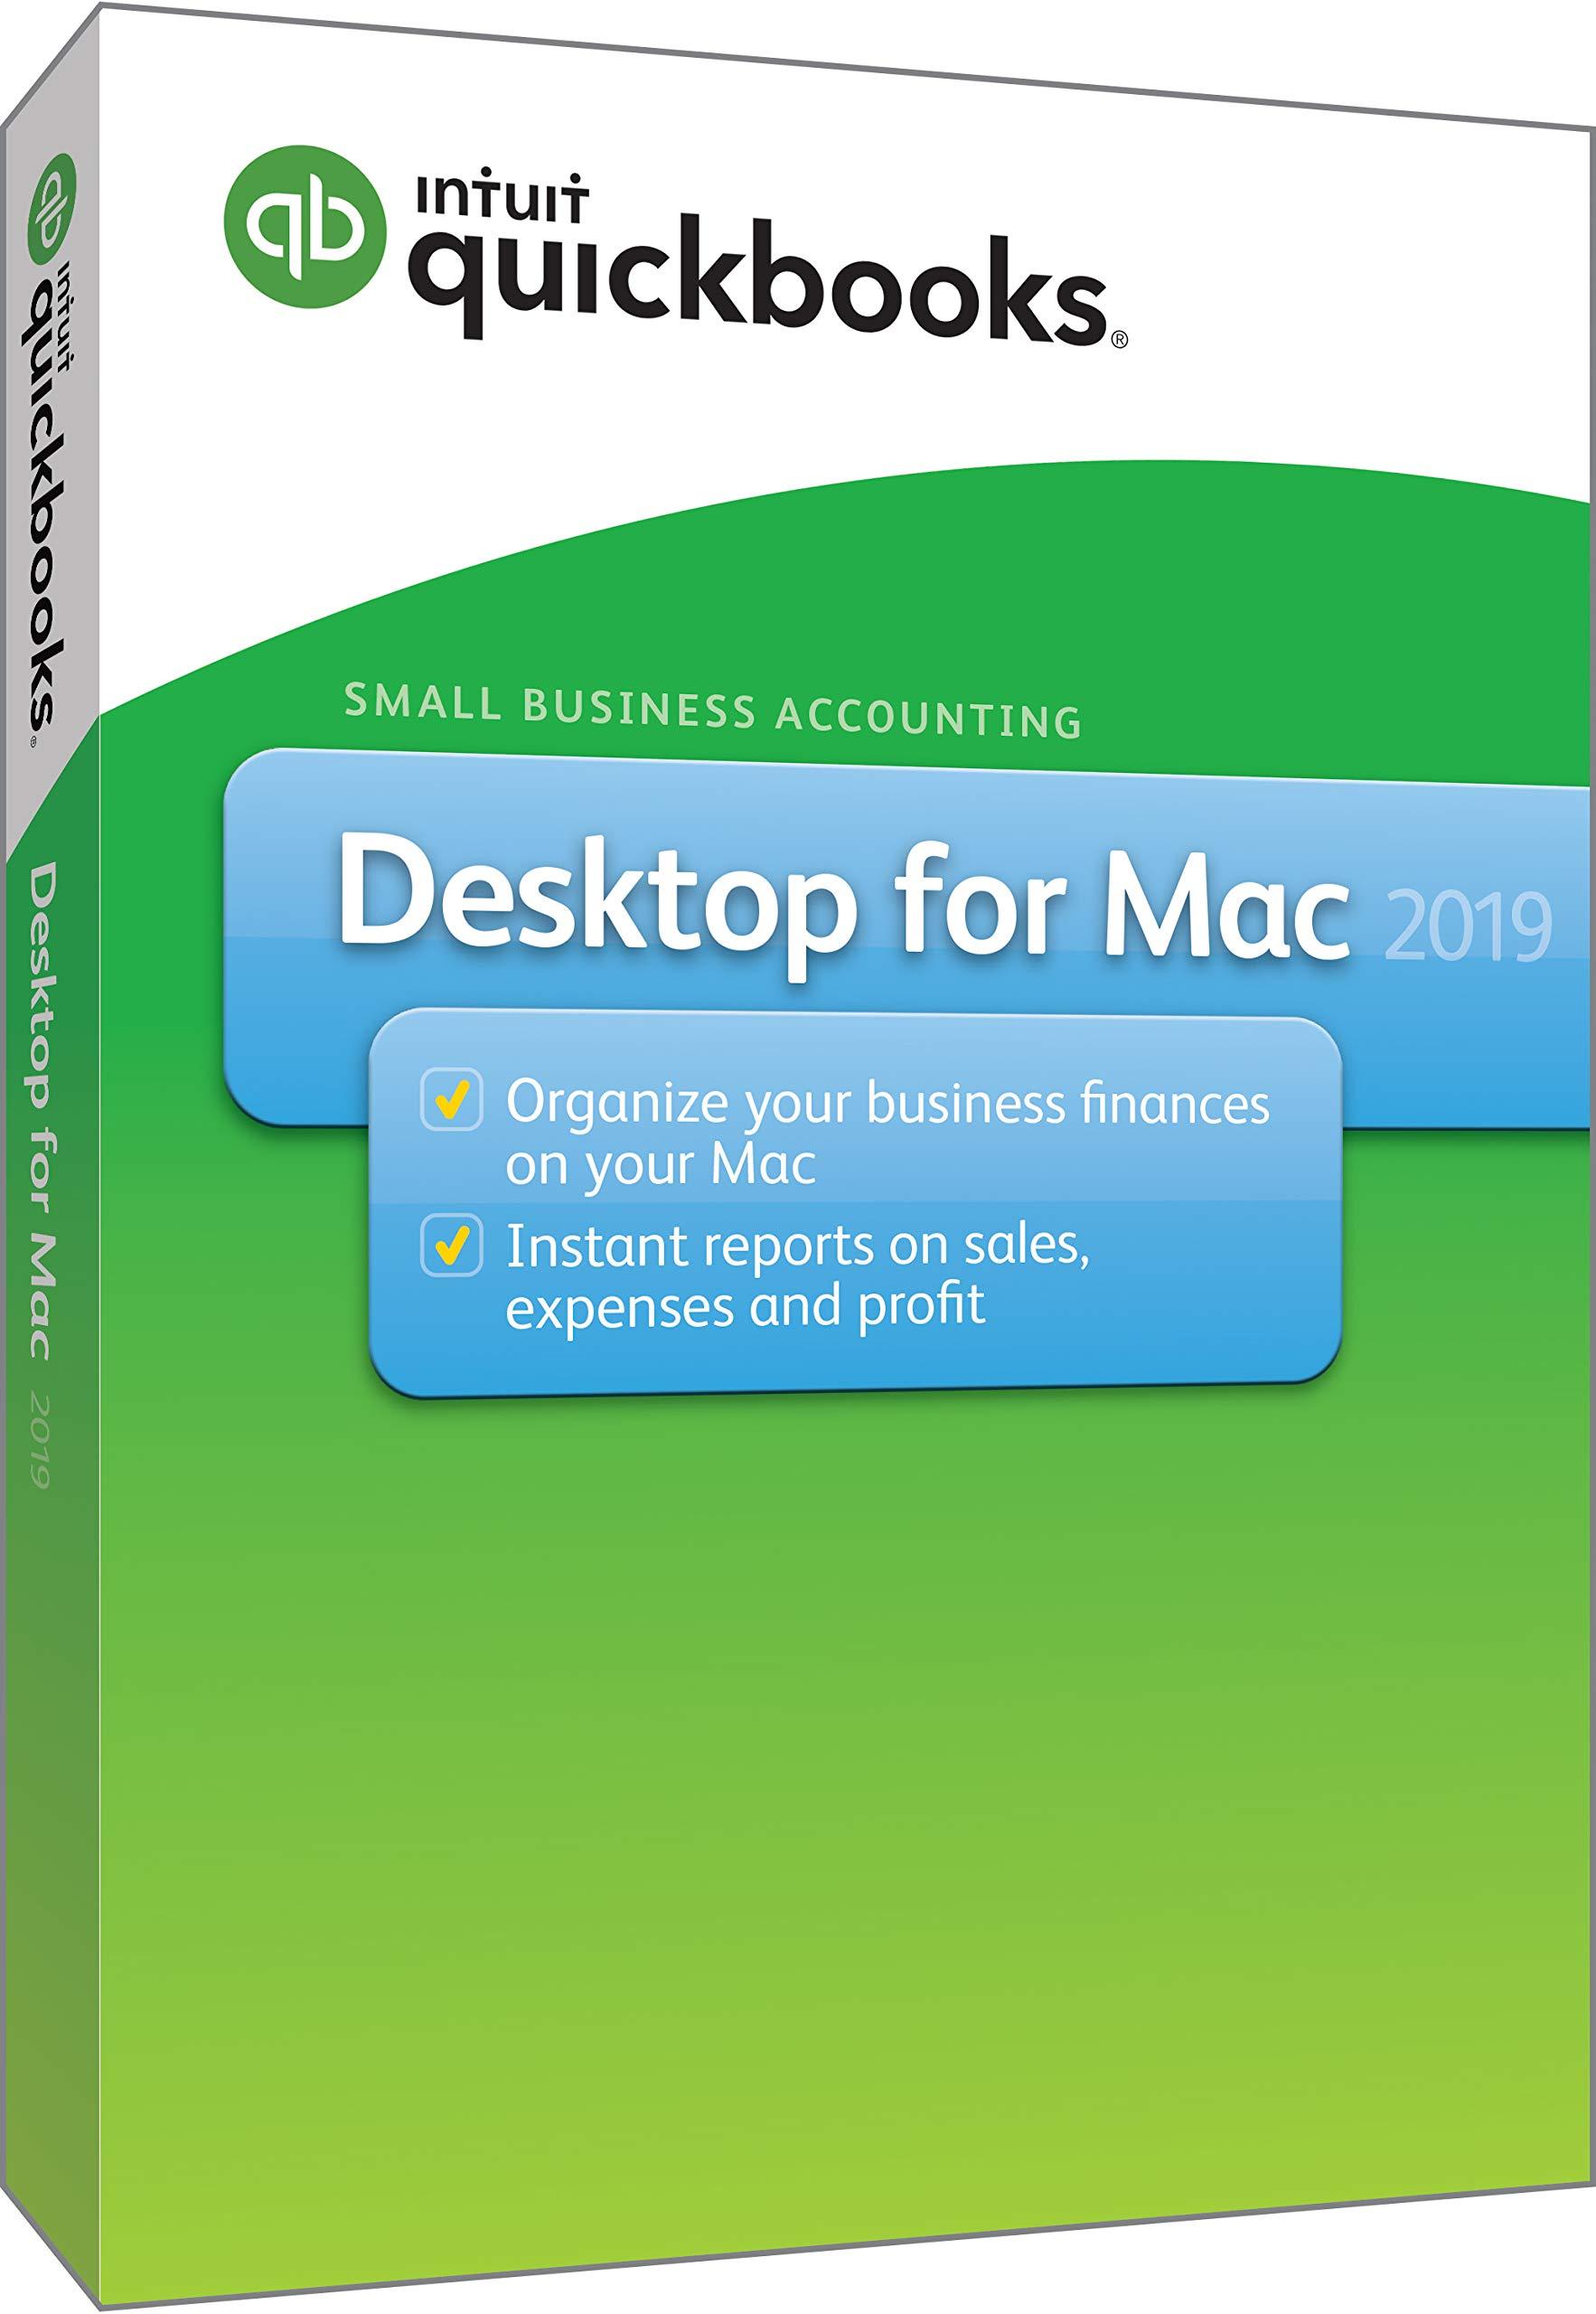 QuickBooks Desktop For Mac 2019 [Mac Disc] by Intuit